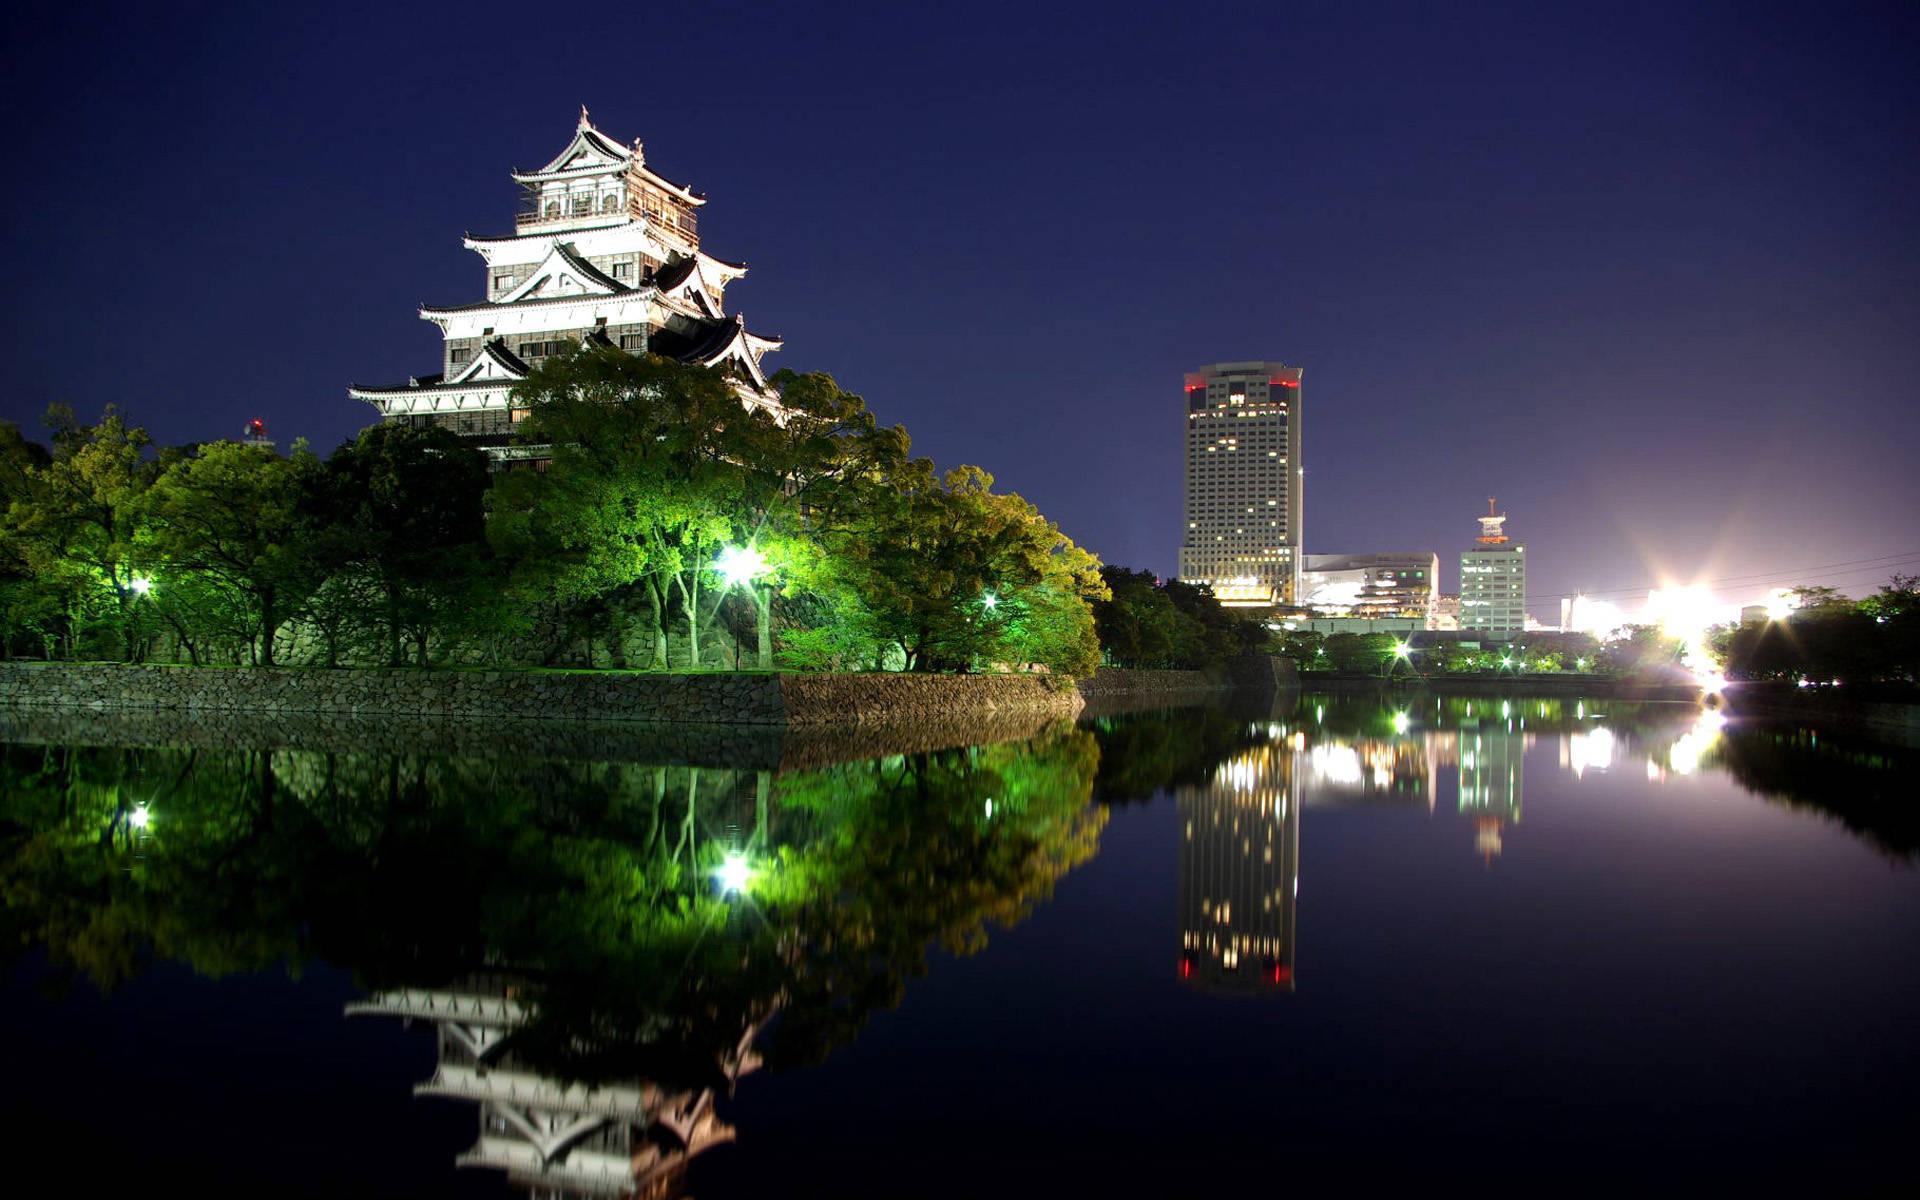 Hiroshima city castle at night